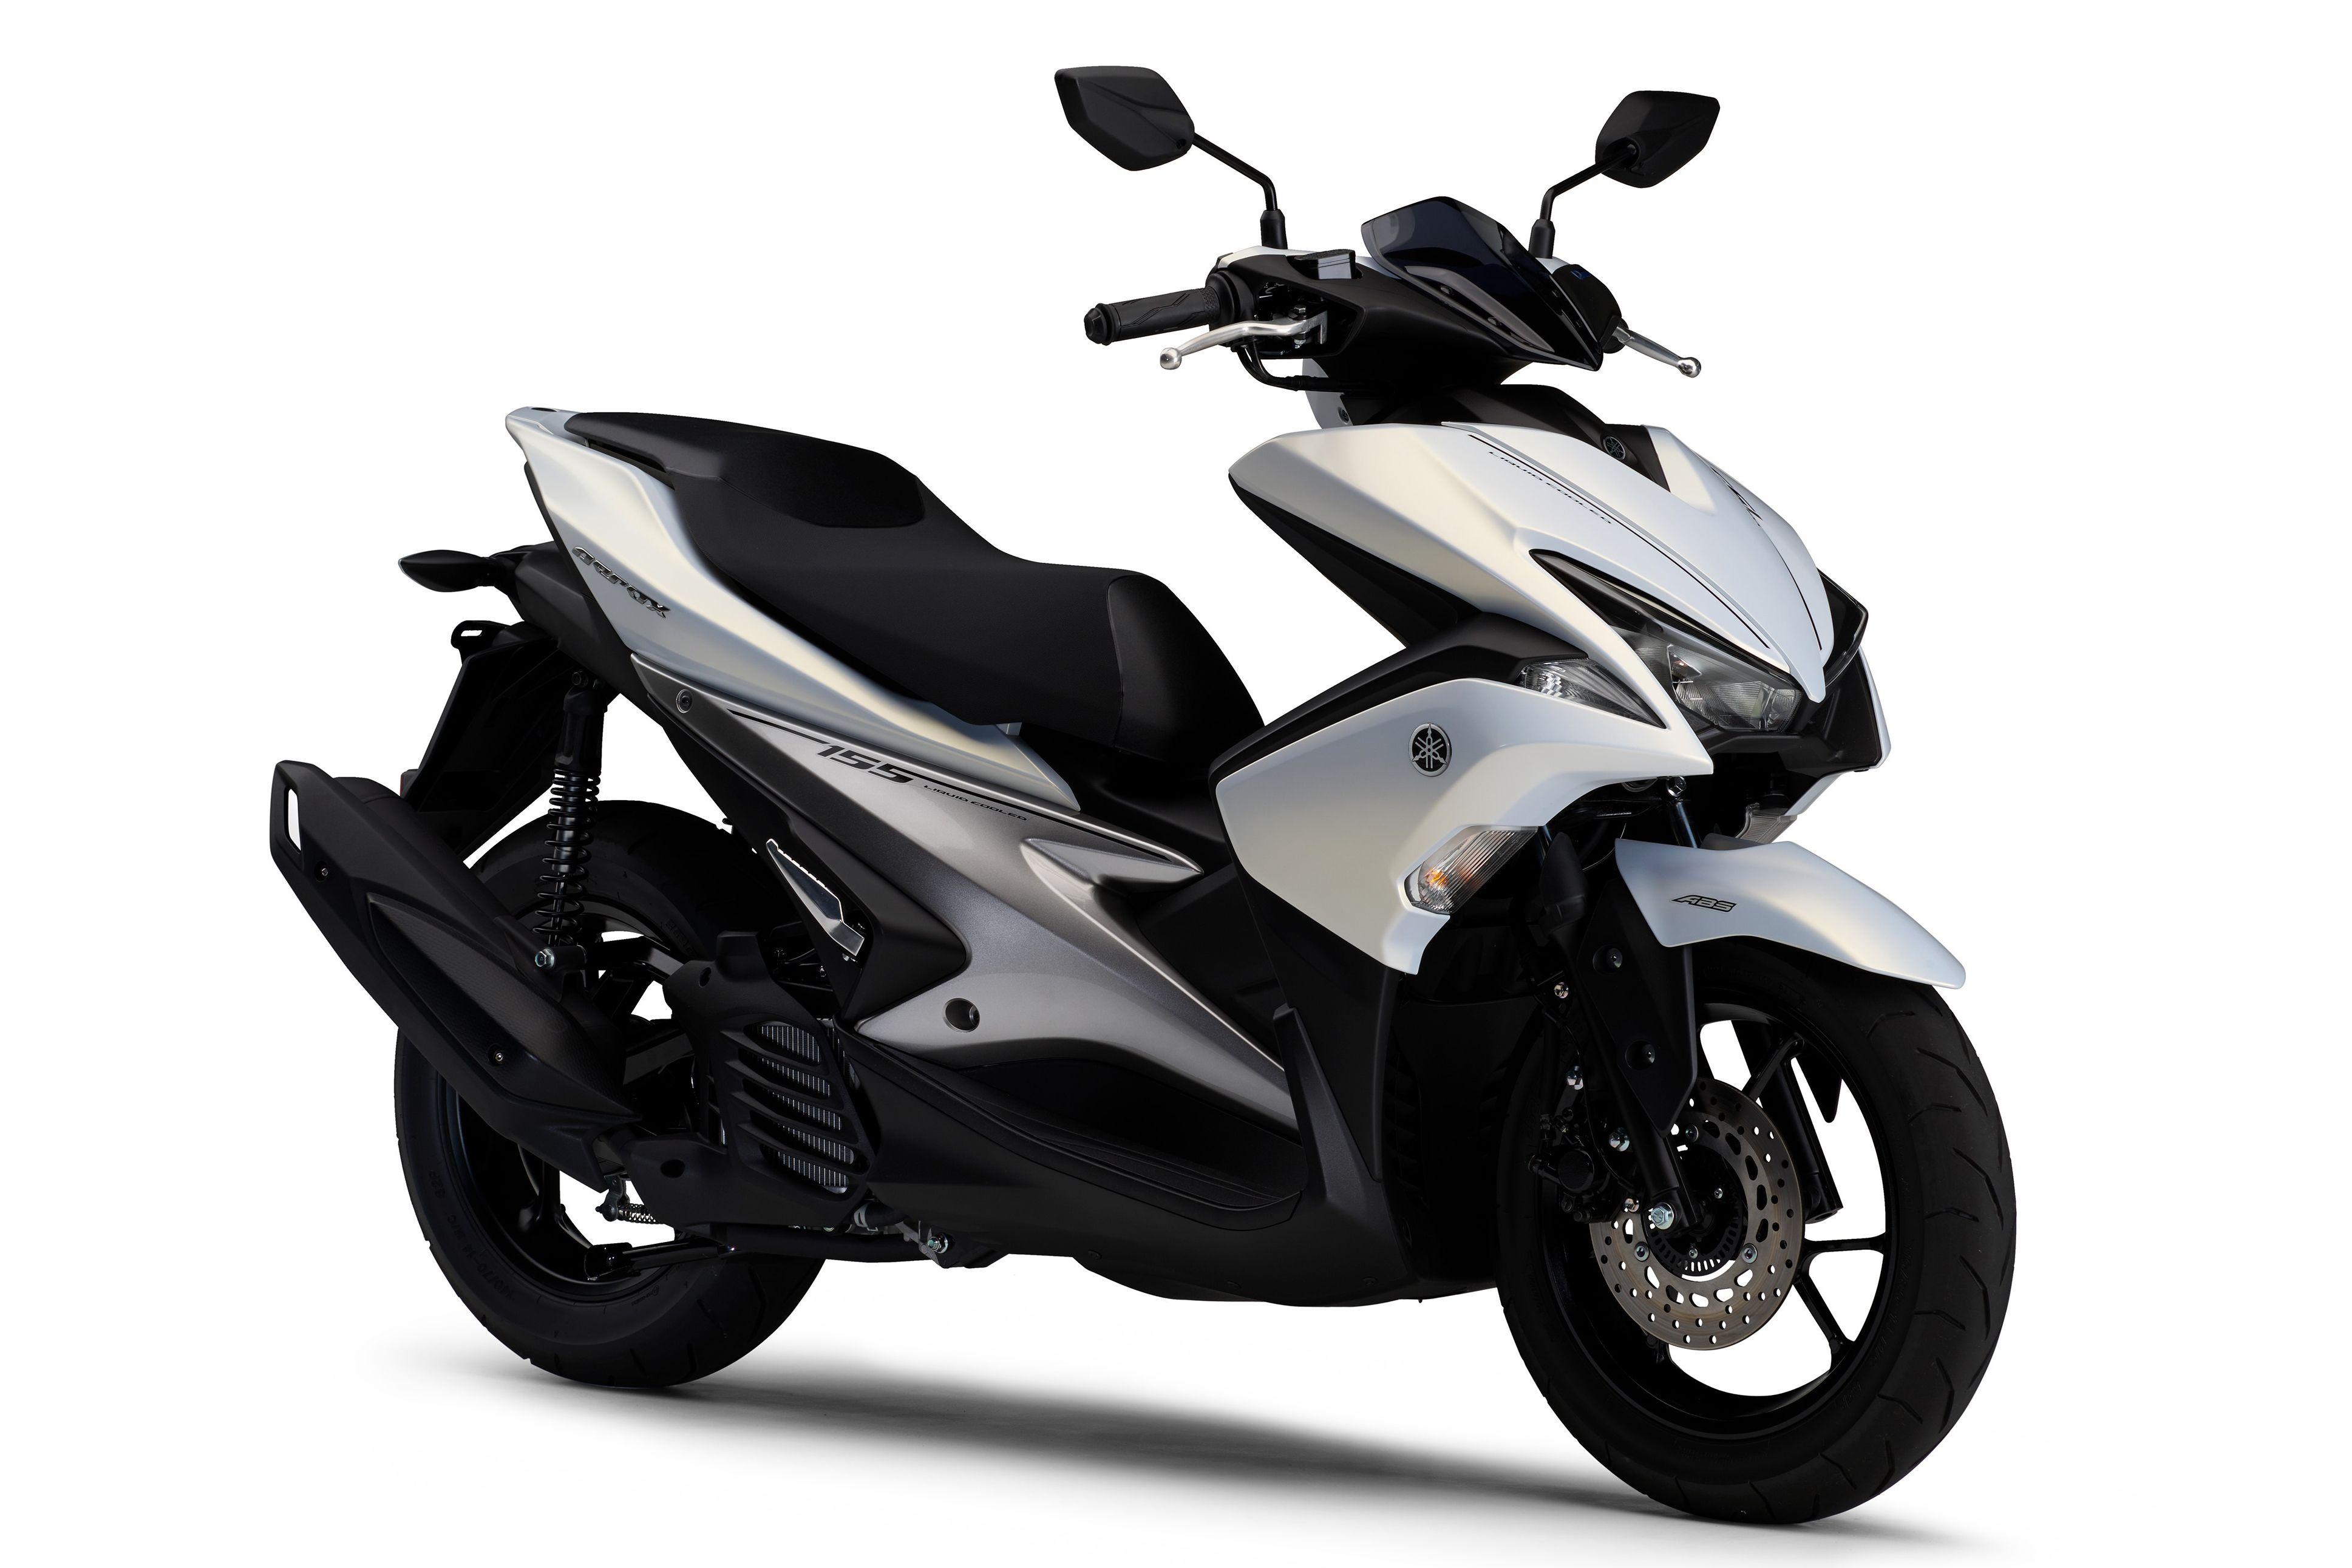 YAMAHA AEROX 155 大舉進軍東協市場 Aerox 155 yamaha, Yamaha, Scooter